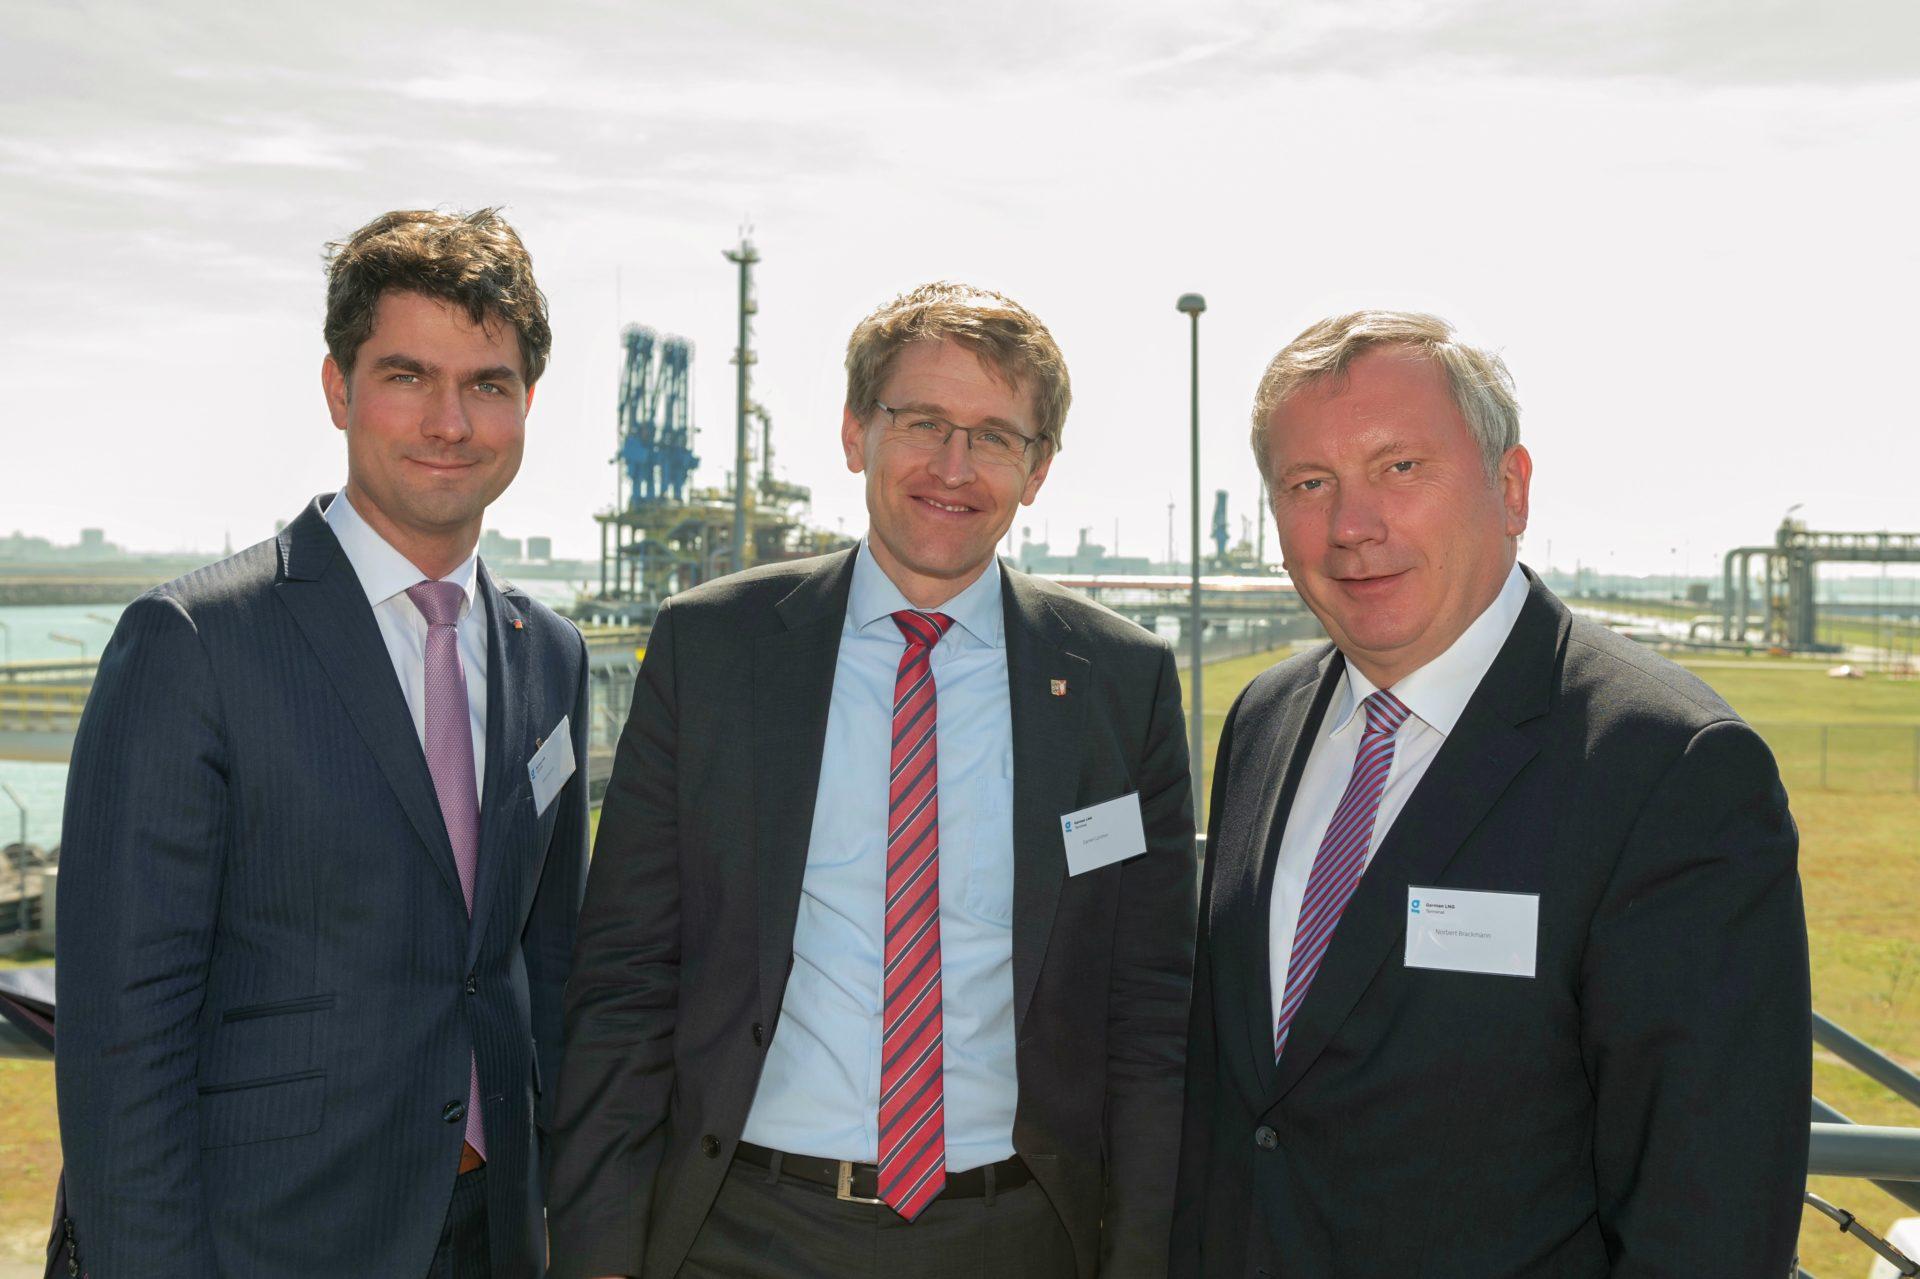 Mark Helfrich, Daniel Günther und Norbert Brackmann beim LNG-Terminal in Rotterdam - Foto Paul Martens